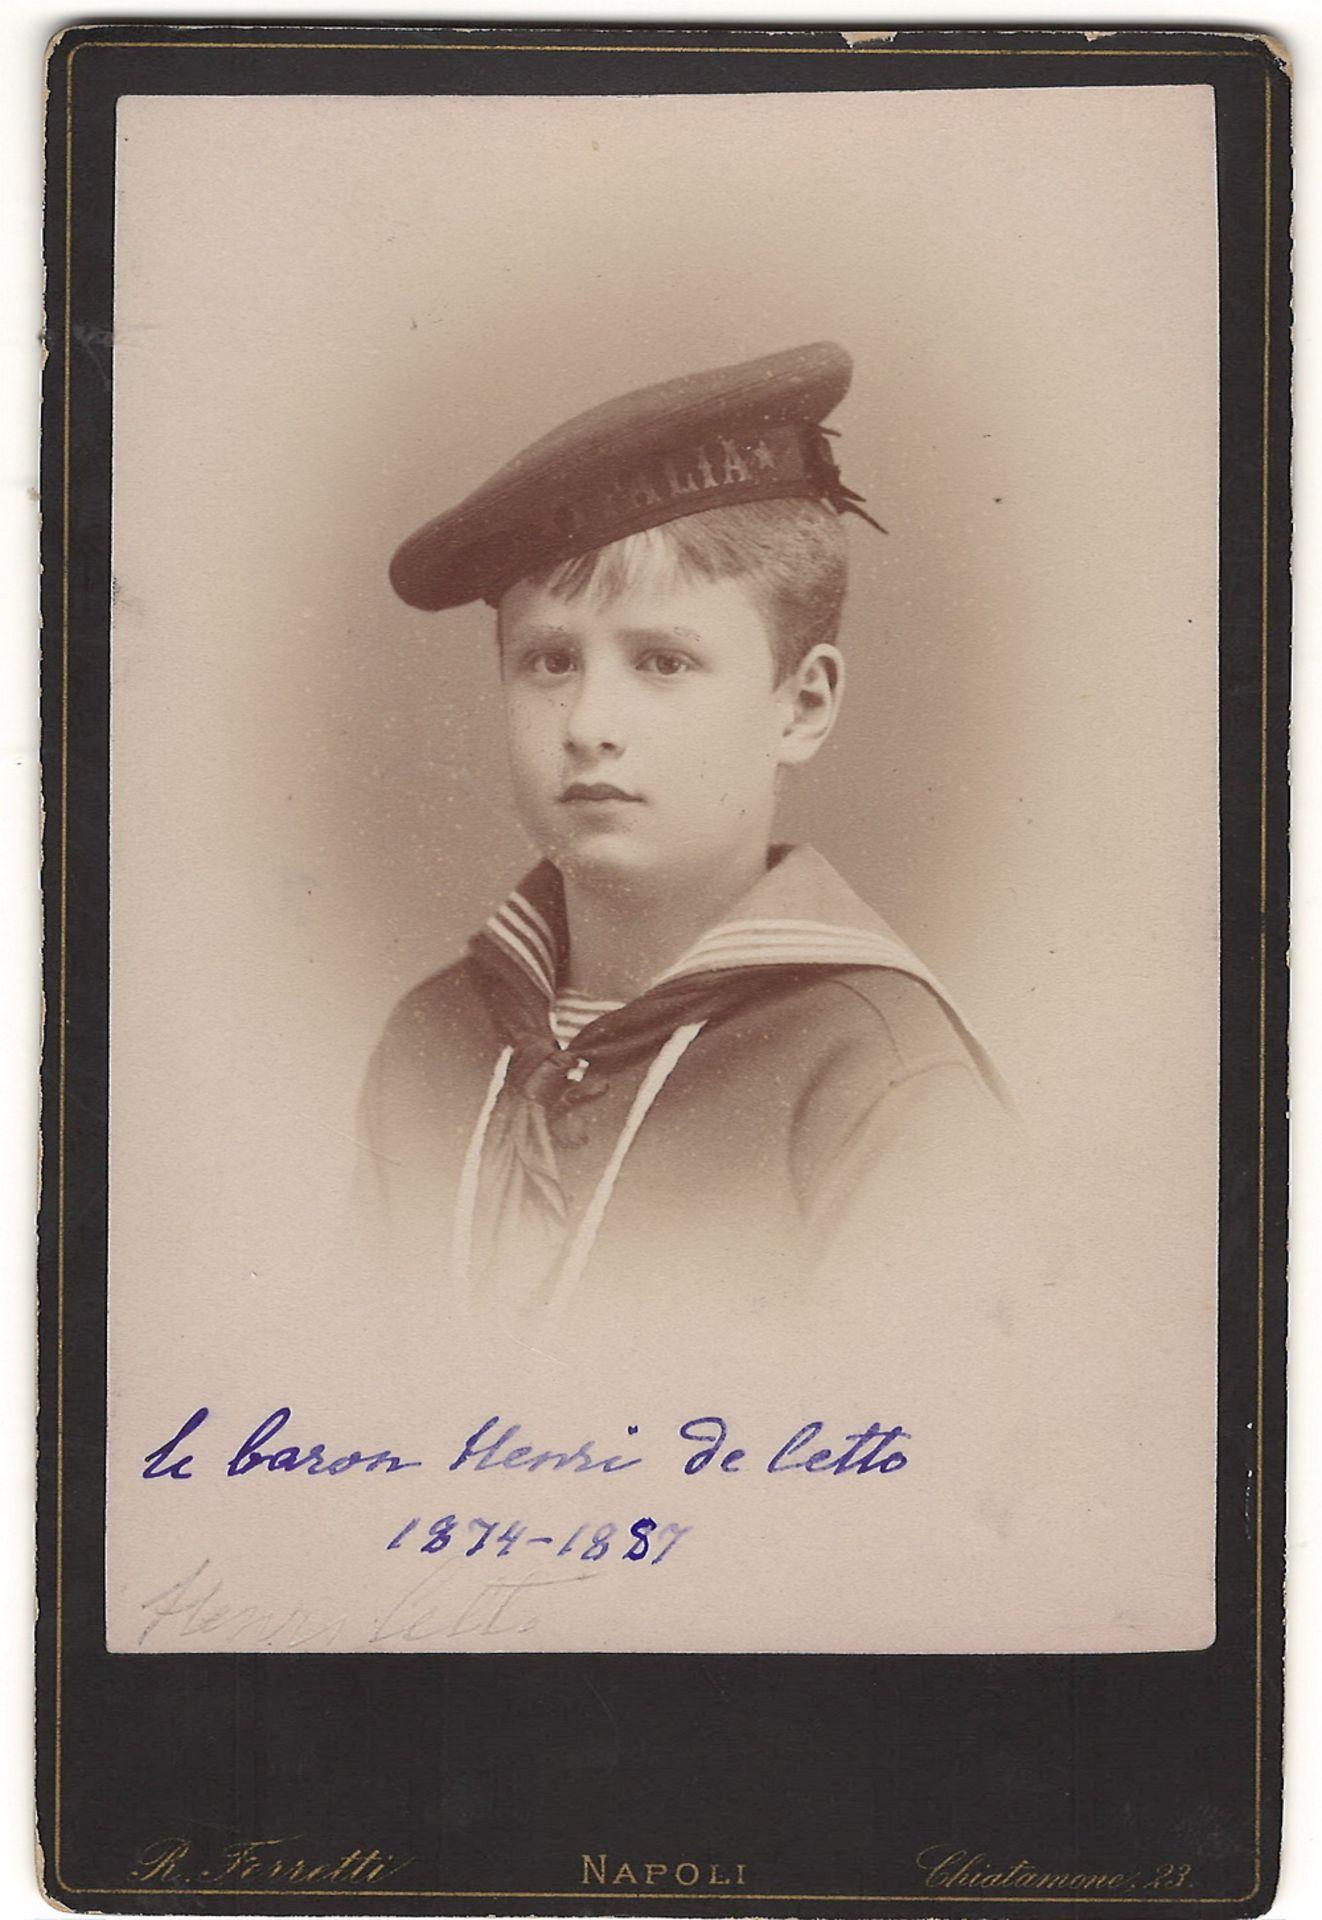 Ferretti, R. 2 cabinet portraits of prince Henry de Cetto. Photographs. Author's prints. [1885]. 16,